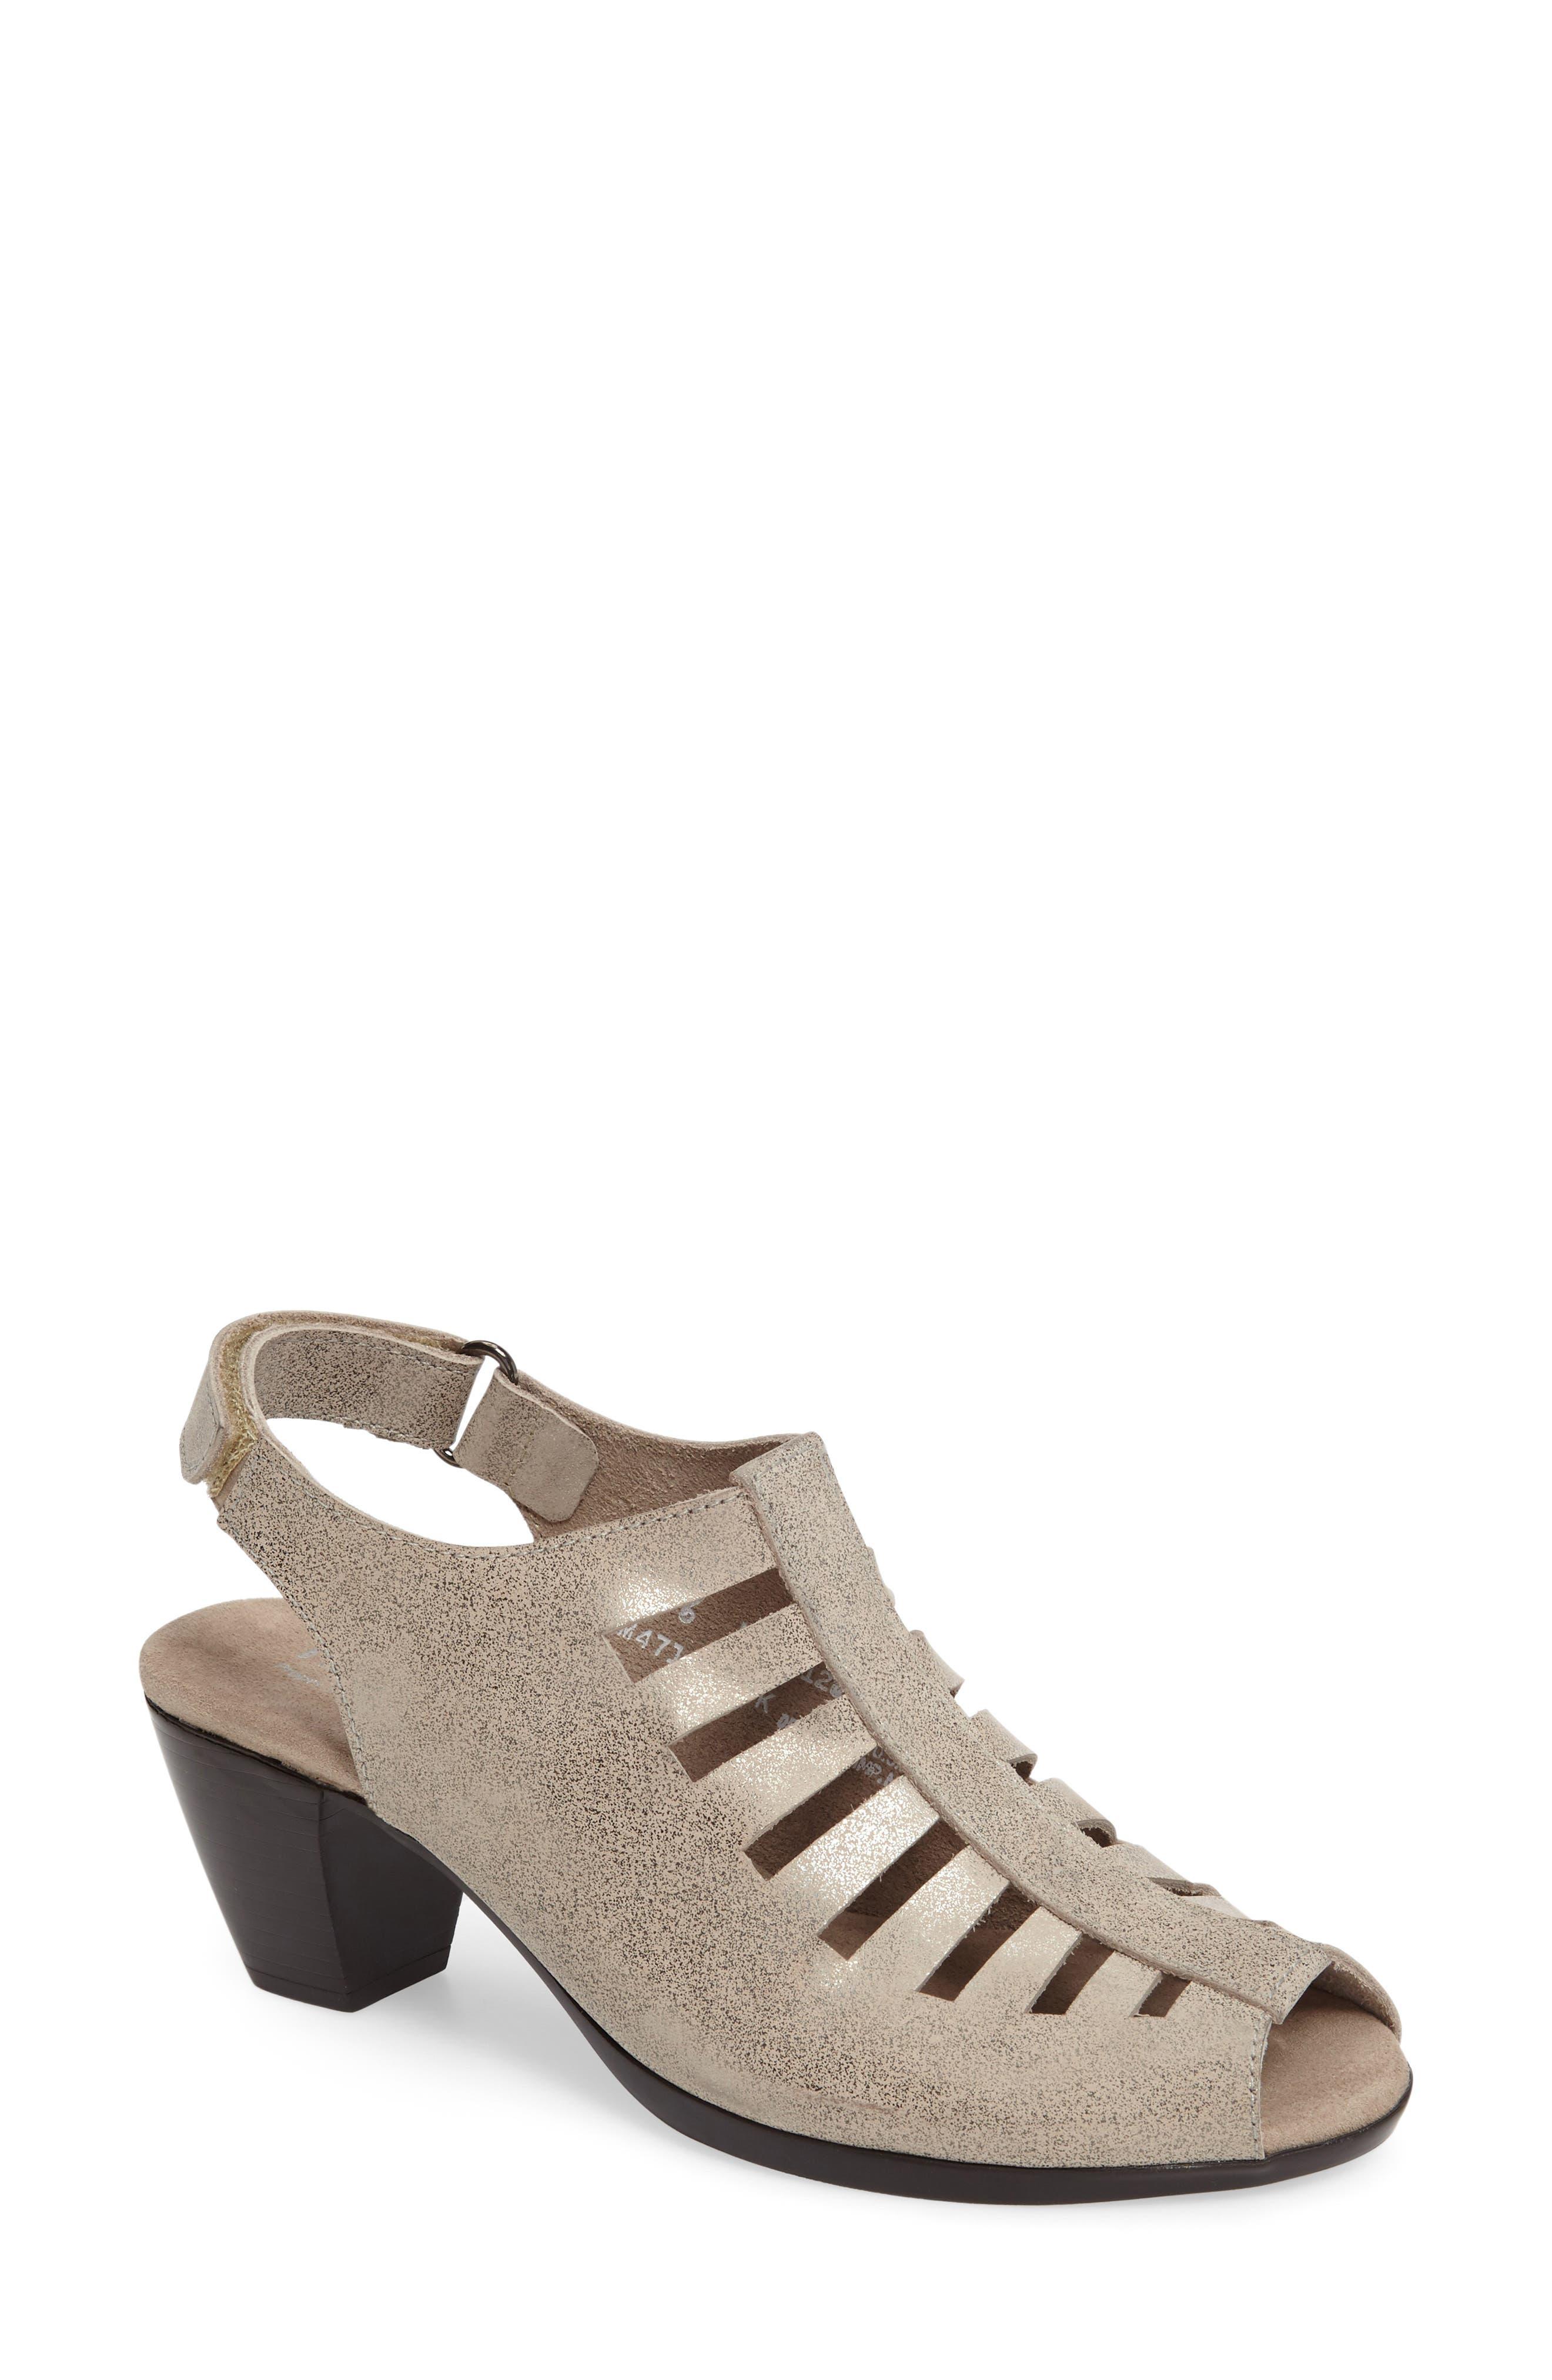 'Abby' Slingback Sandal,                         Main,                         color, Silver Metallic